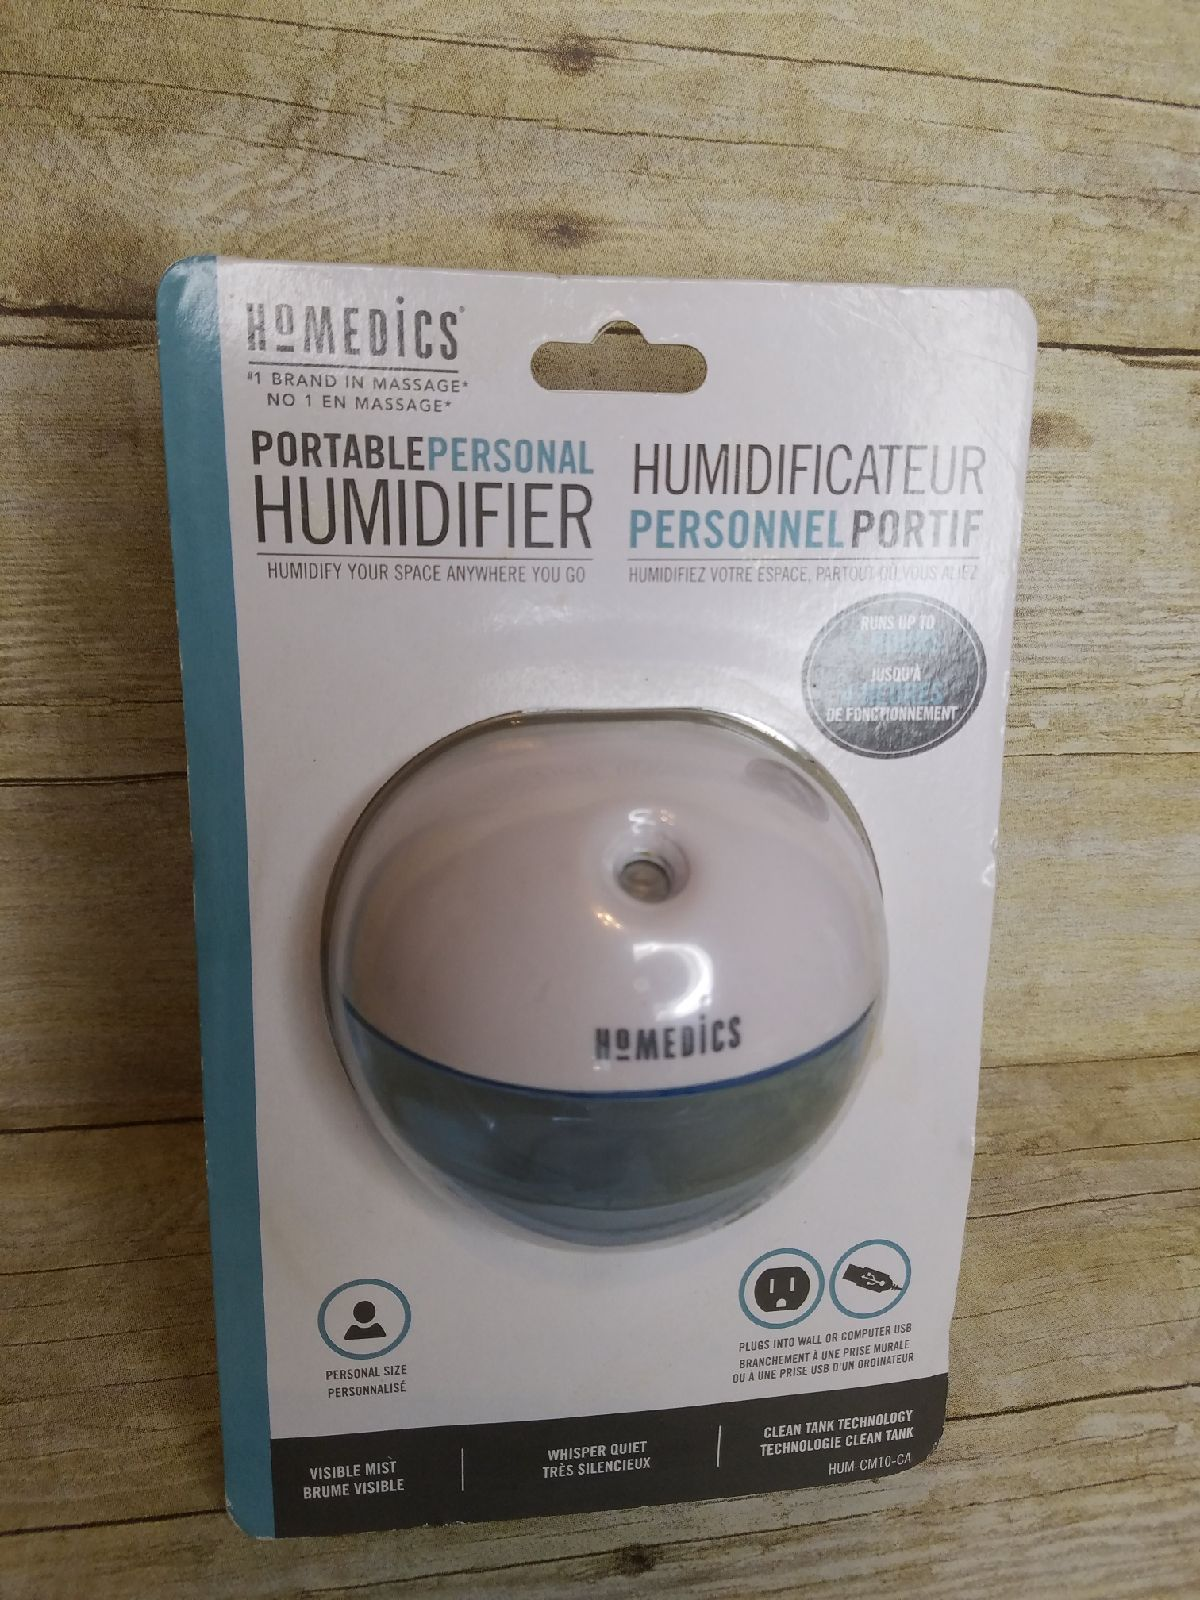 Homedics Portable Personal Humidifier Humidifier